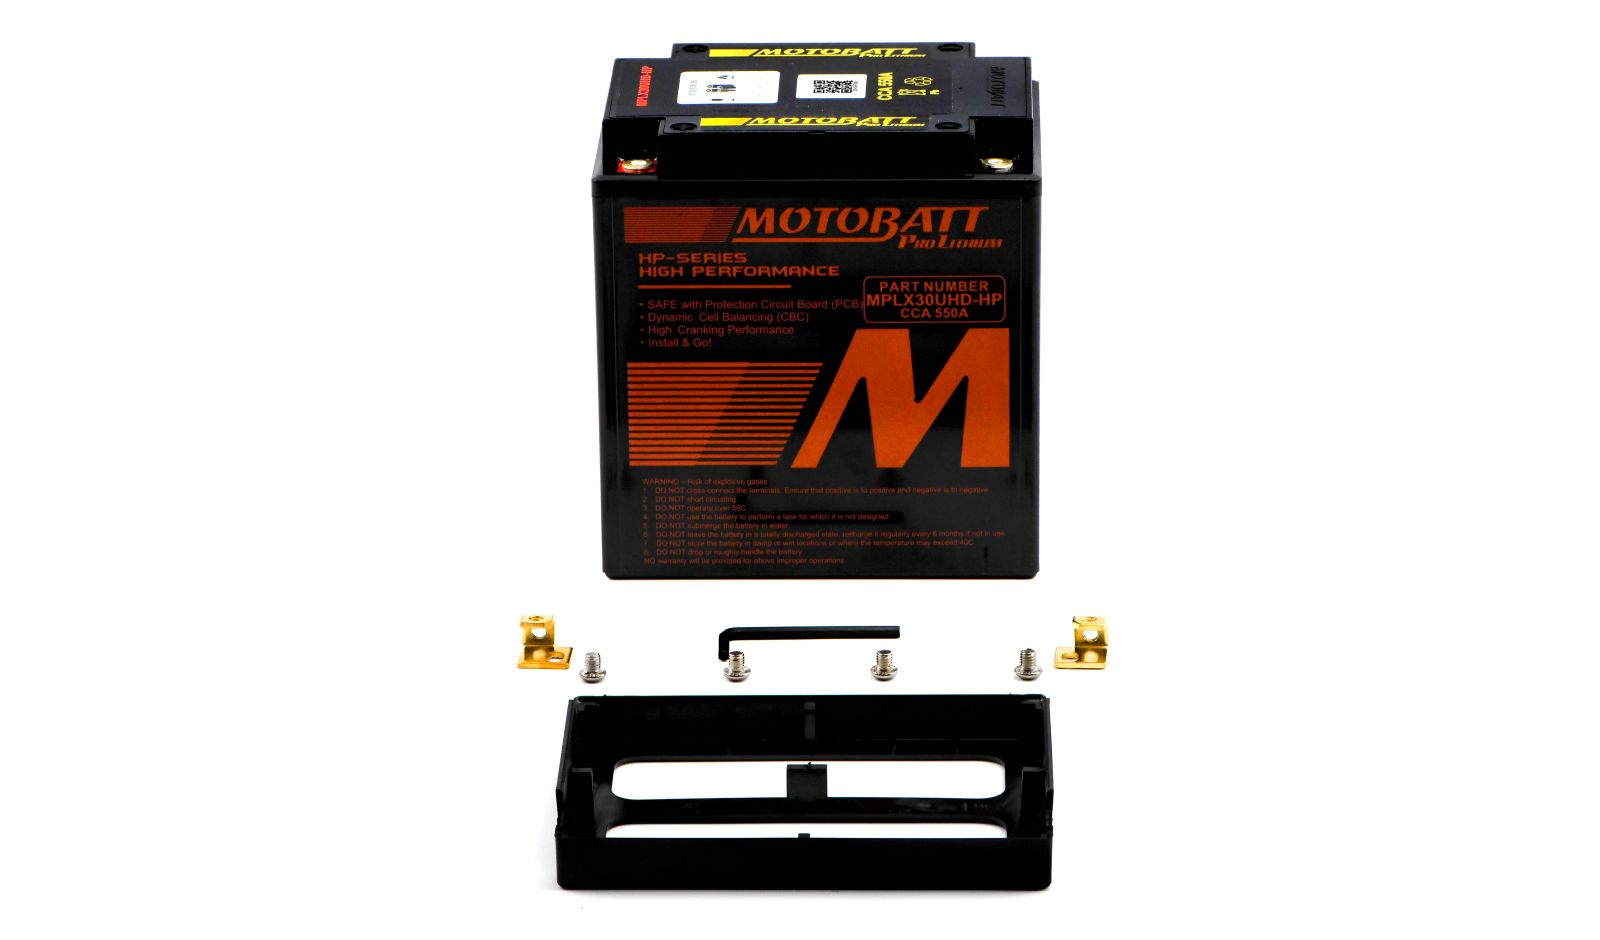 Motobatt Lithium Batteries - 501305MR image